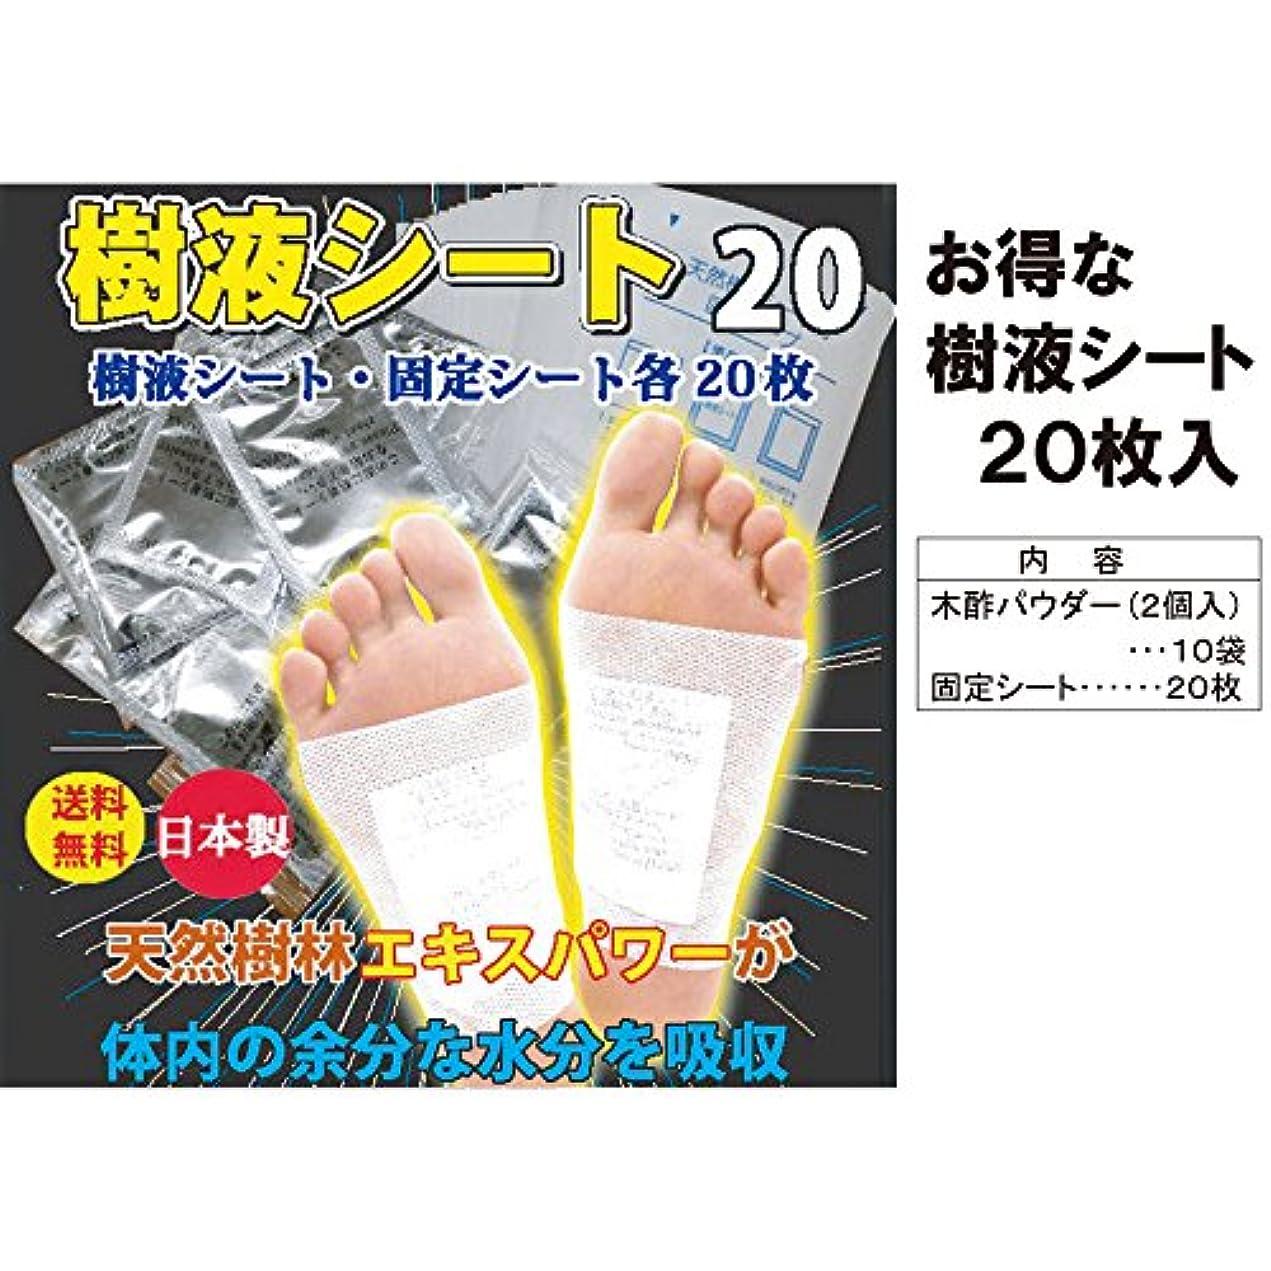 M&Sジャパン 日本製 足裏樹液シート 20枚 足裏 シート デトックス お徳用 健康 グッズ 足ツボ